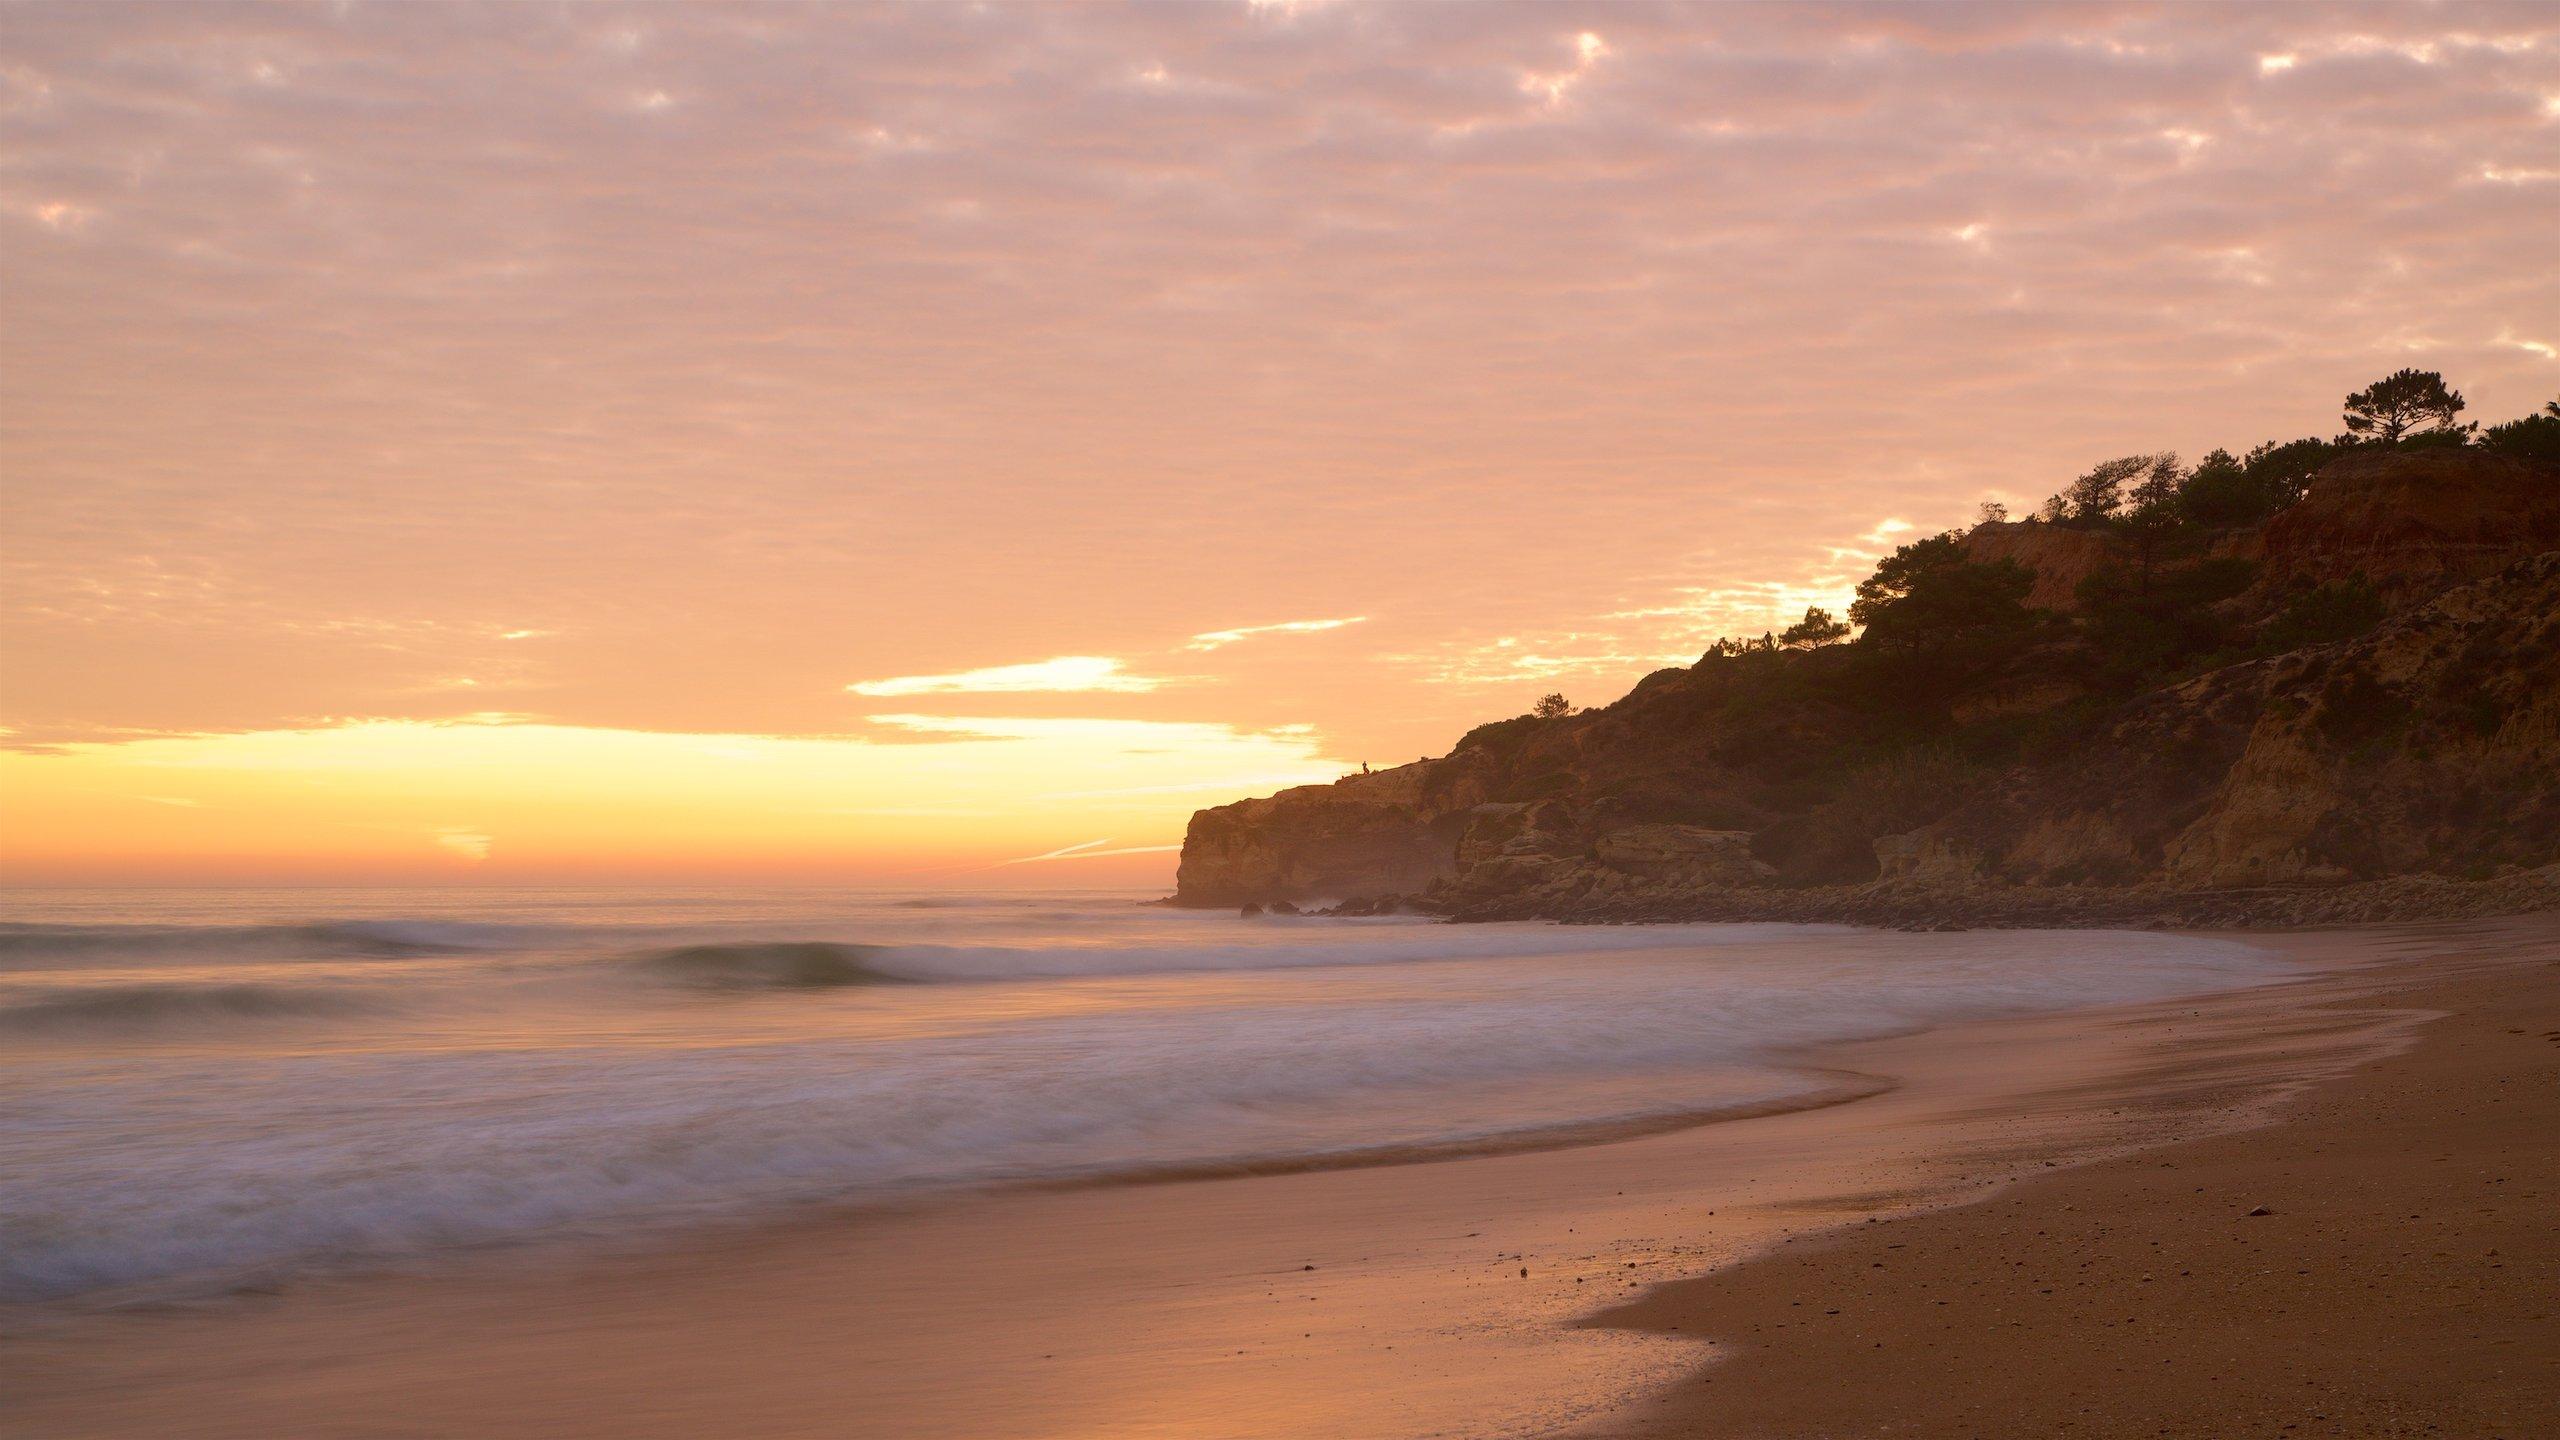 Strand Praia da Falésia, Albufeira, Bezirk Faro, Portugal